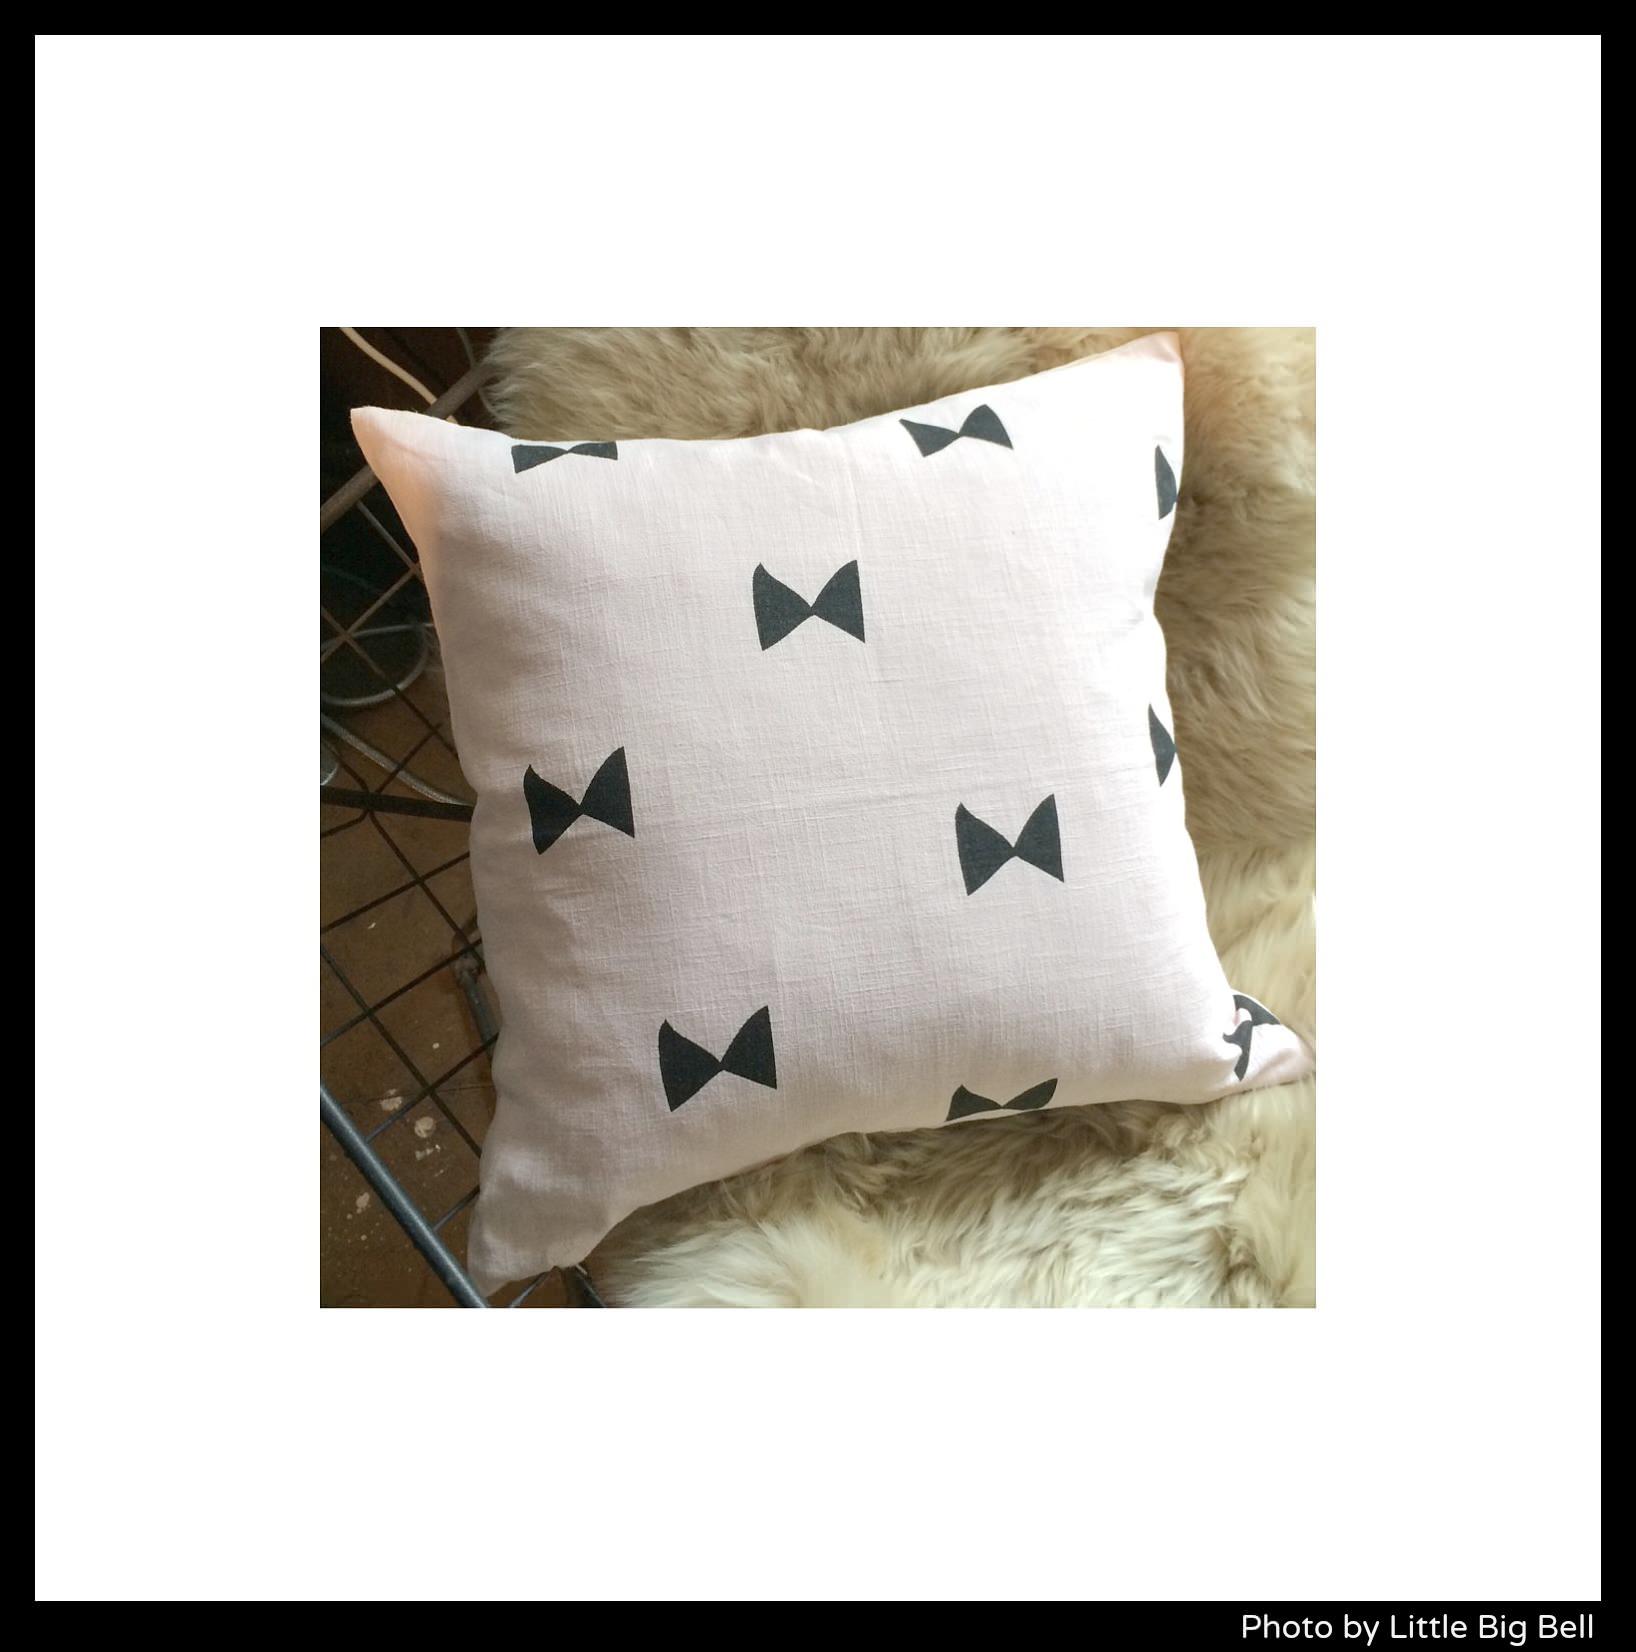 Hollie's-house-cushion-Little-Big-Bell-blog.jpg